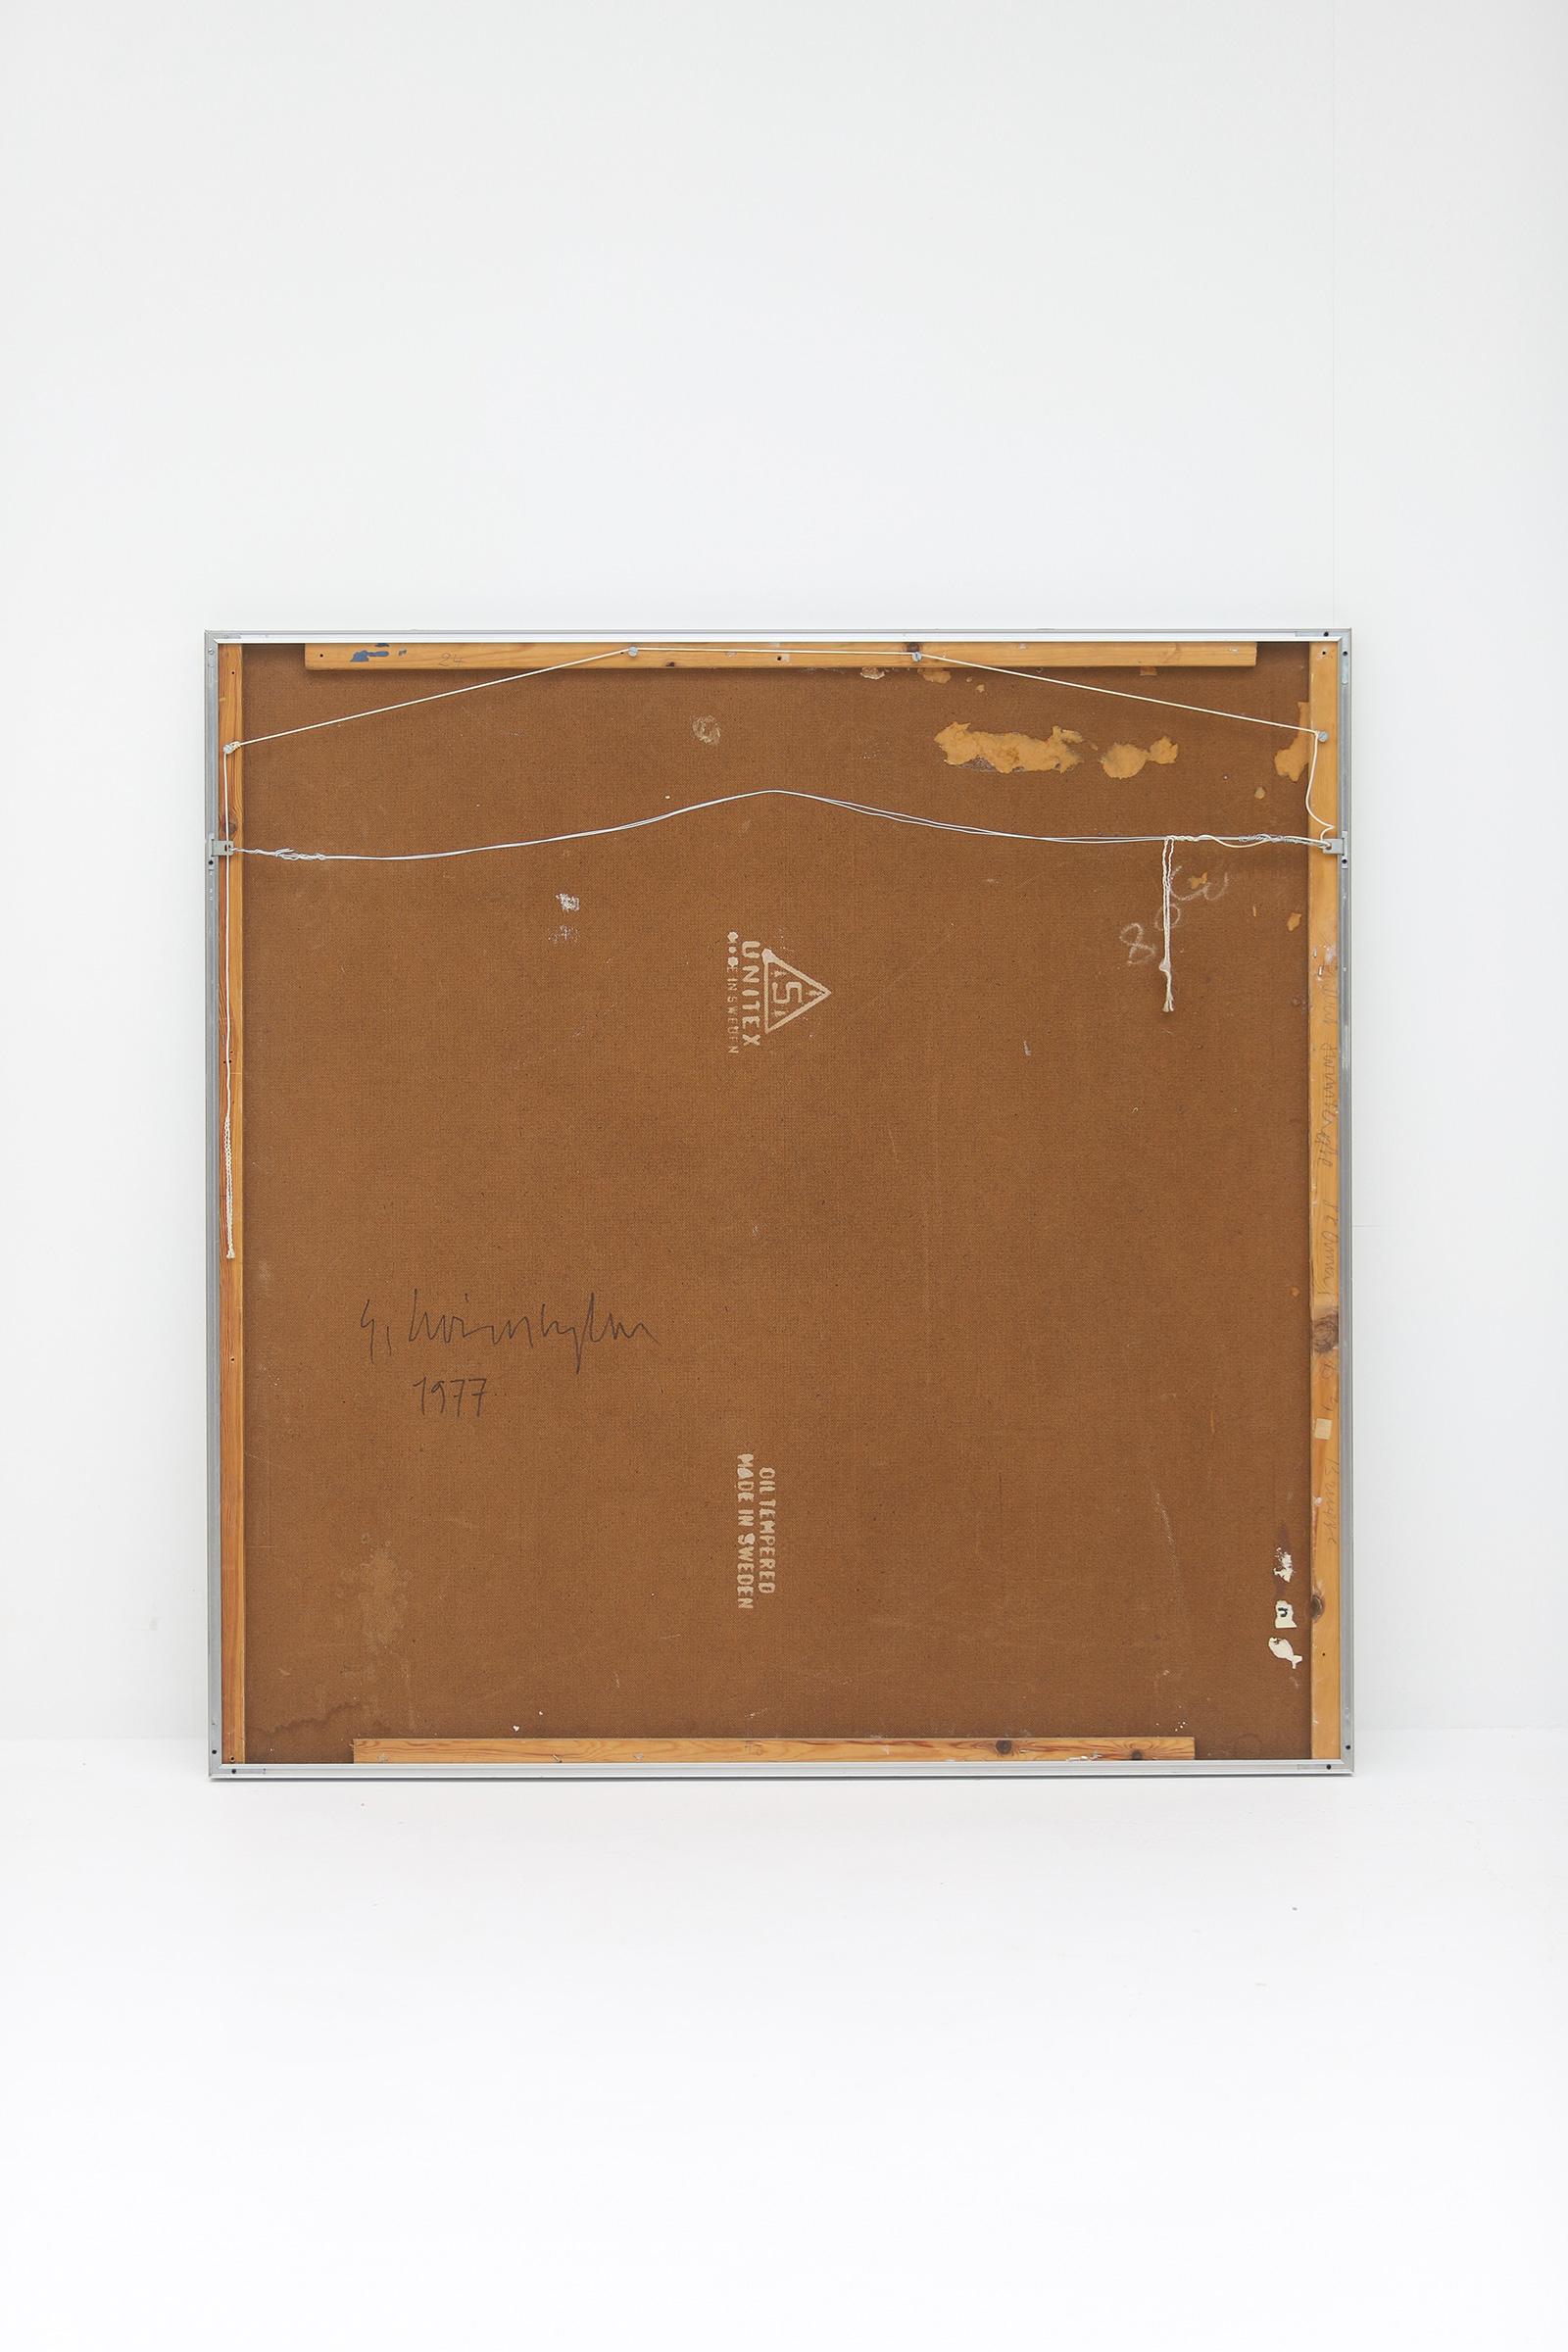 Gilberth Swinberghe Art Work 1977image 7